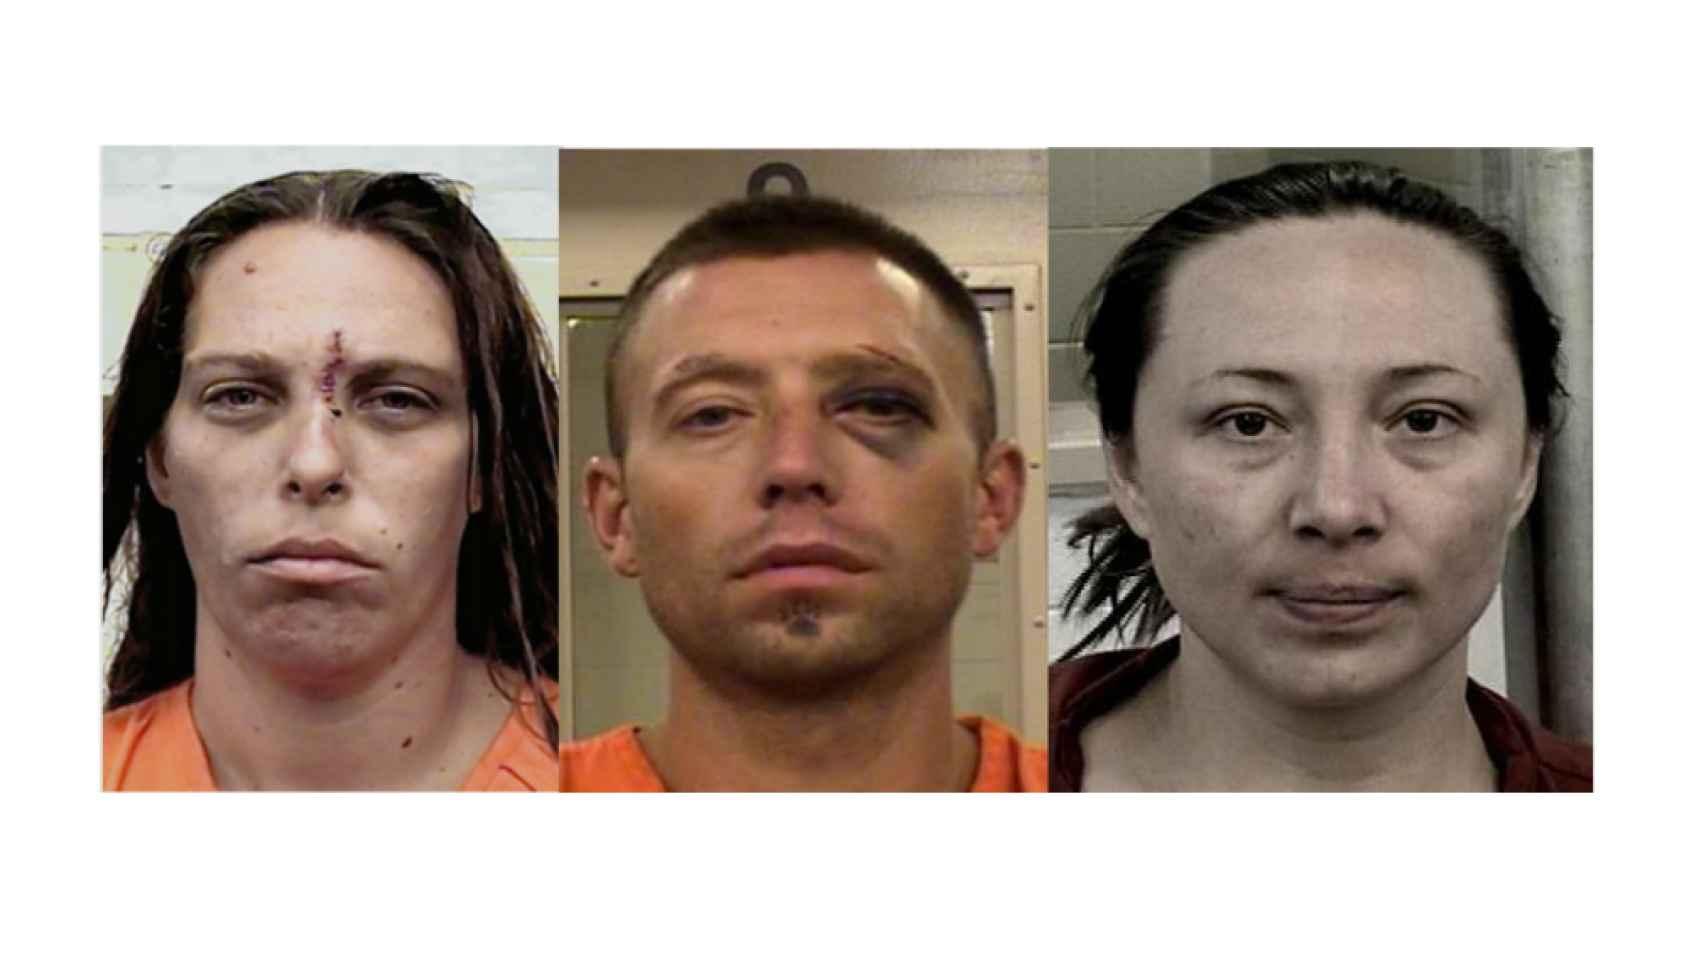 Michelle Martens, Fabian Gonzales, Jessica Kelley, acusados del crimen de Victoria.